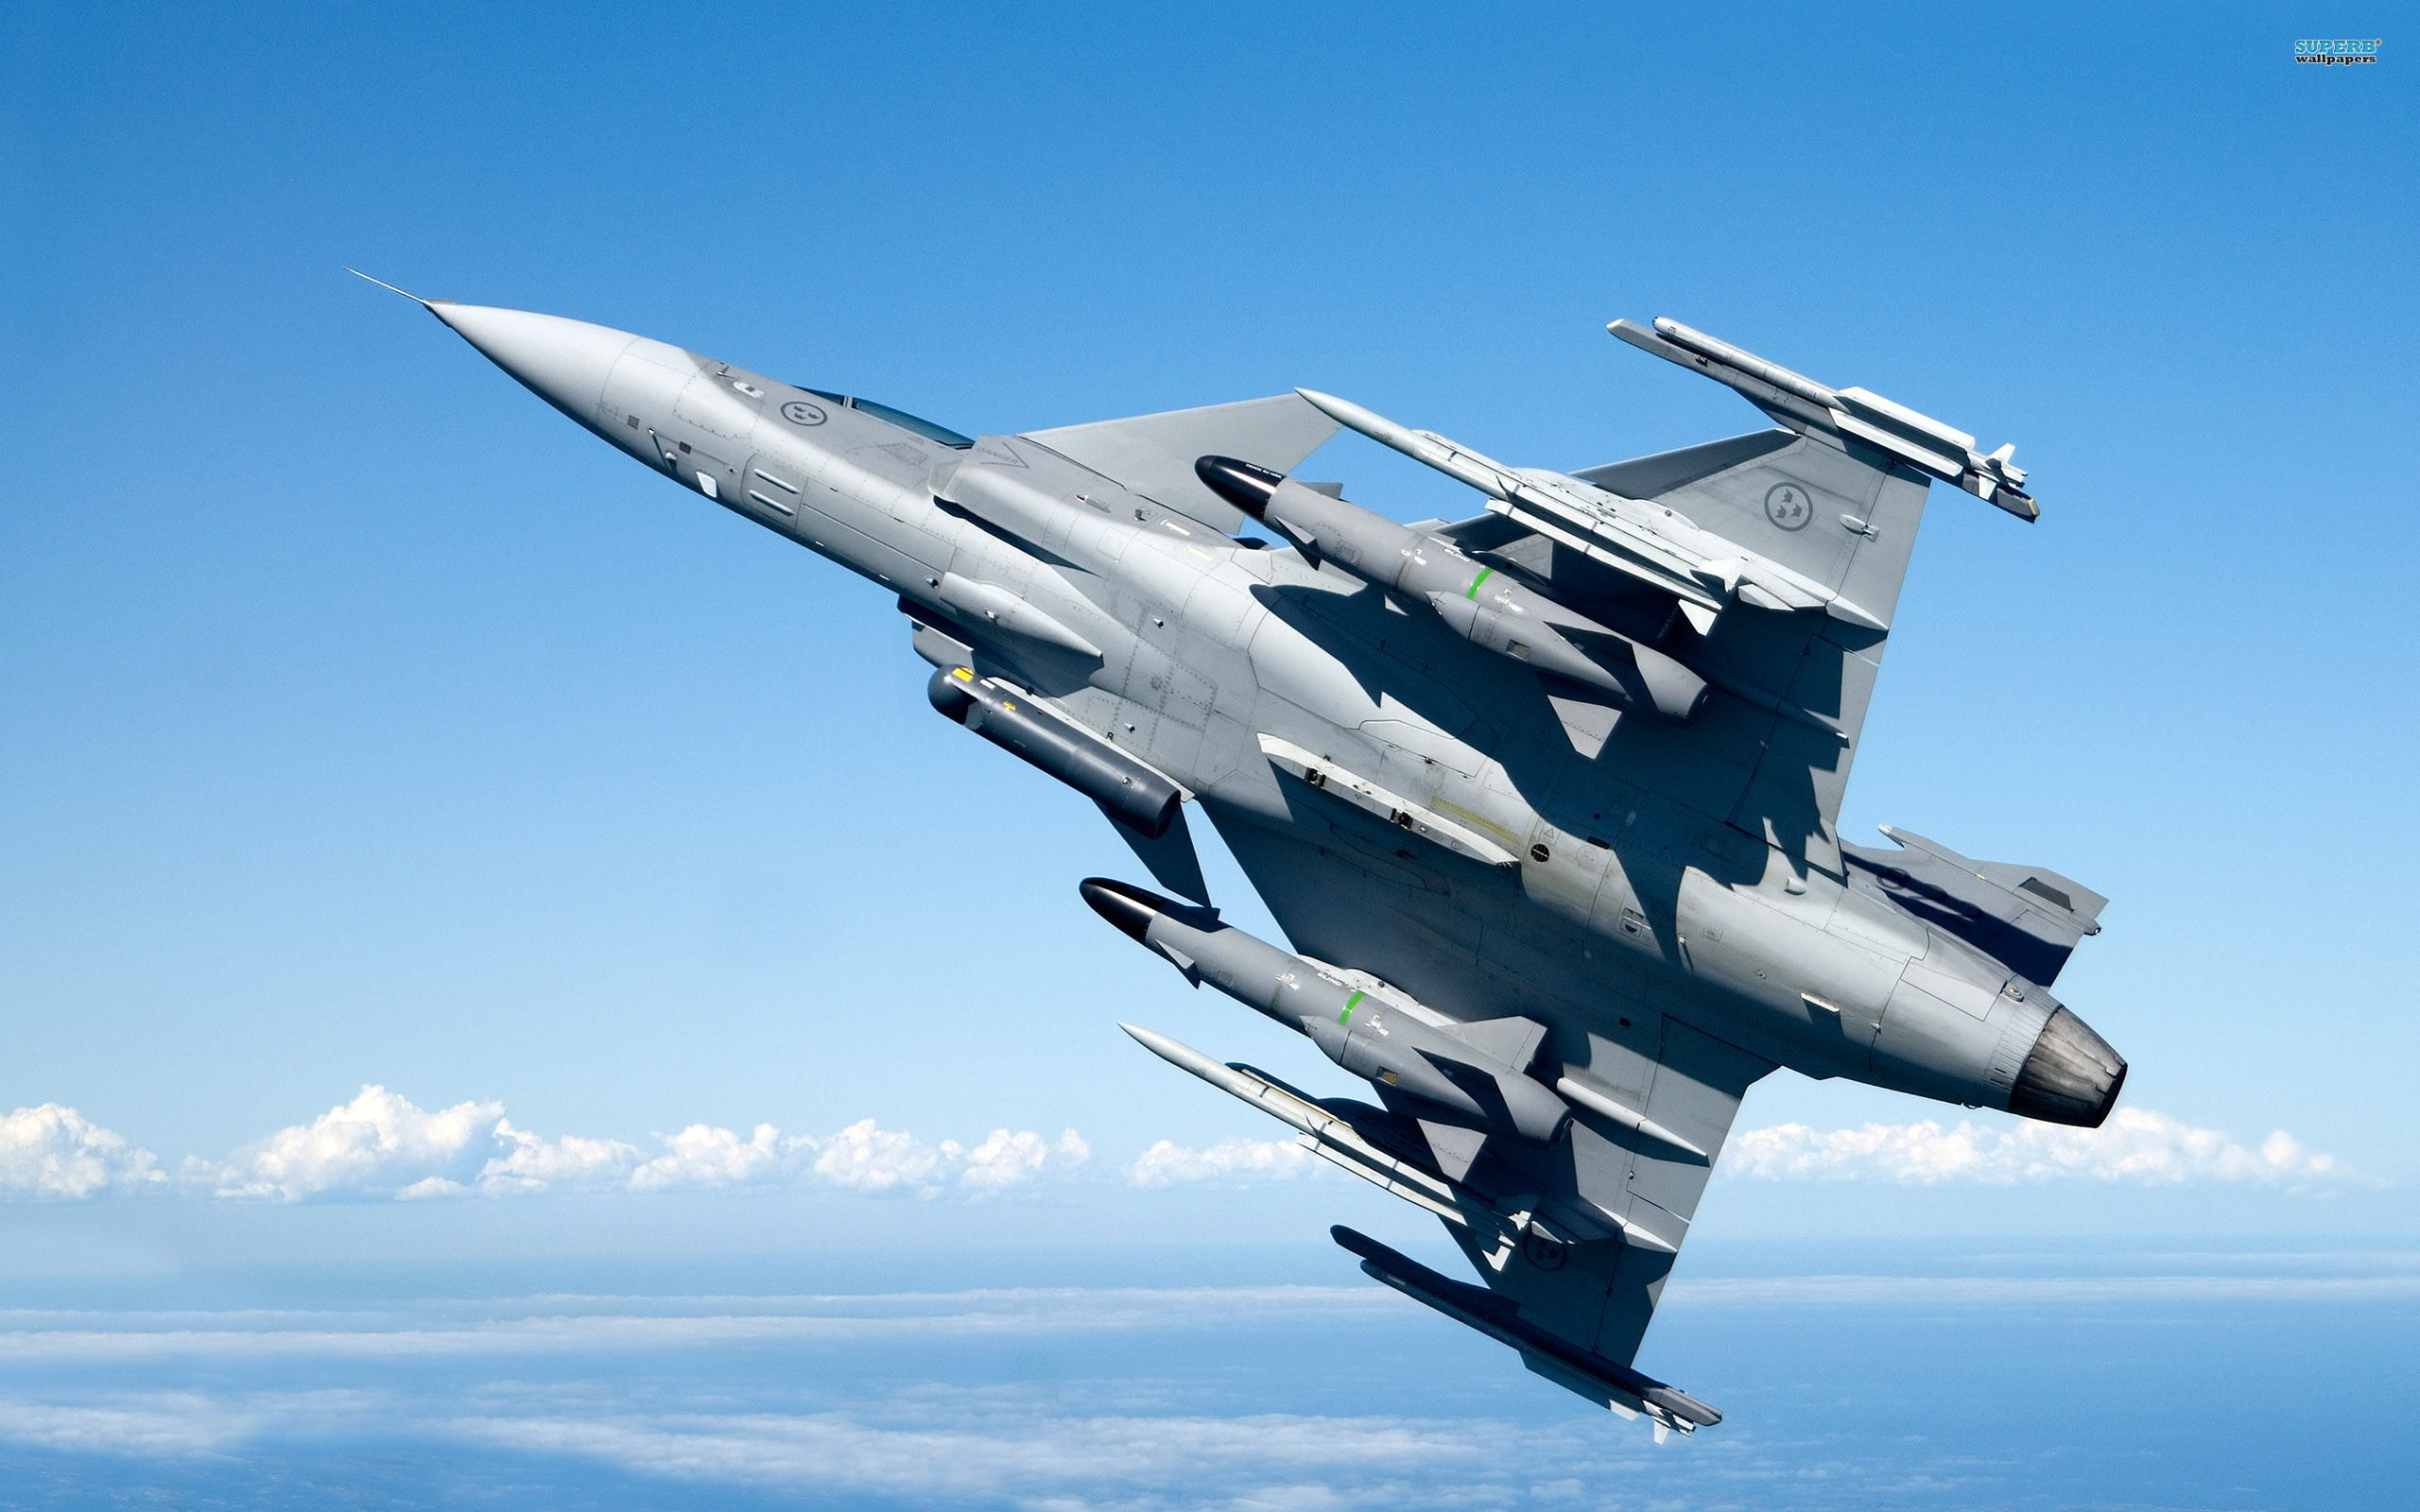 Jas 39 Gripen Air Force Fighter Jets Fighter Jets Saab Jas 39 Gripen